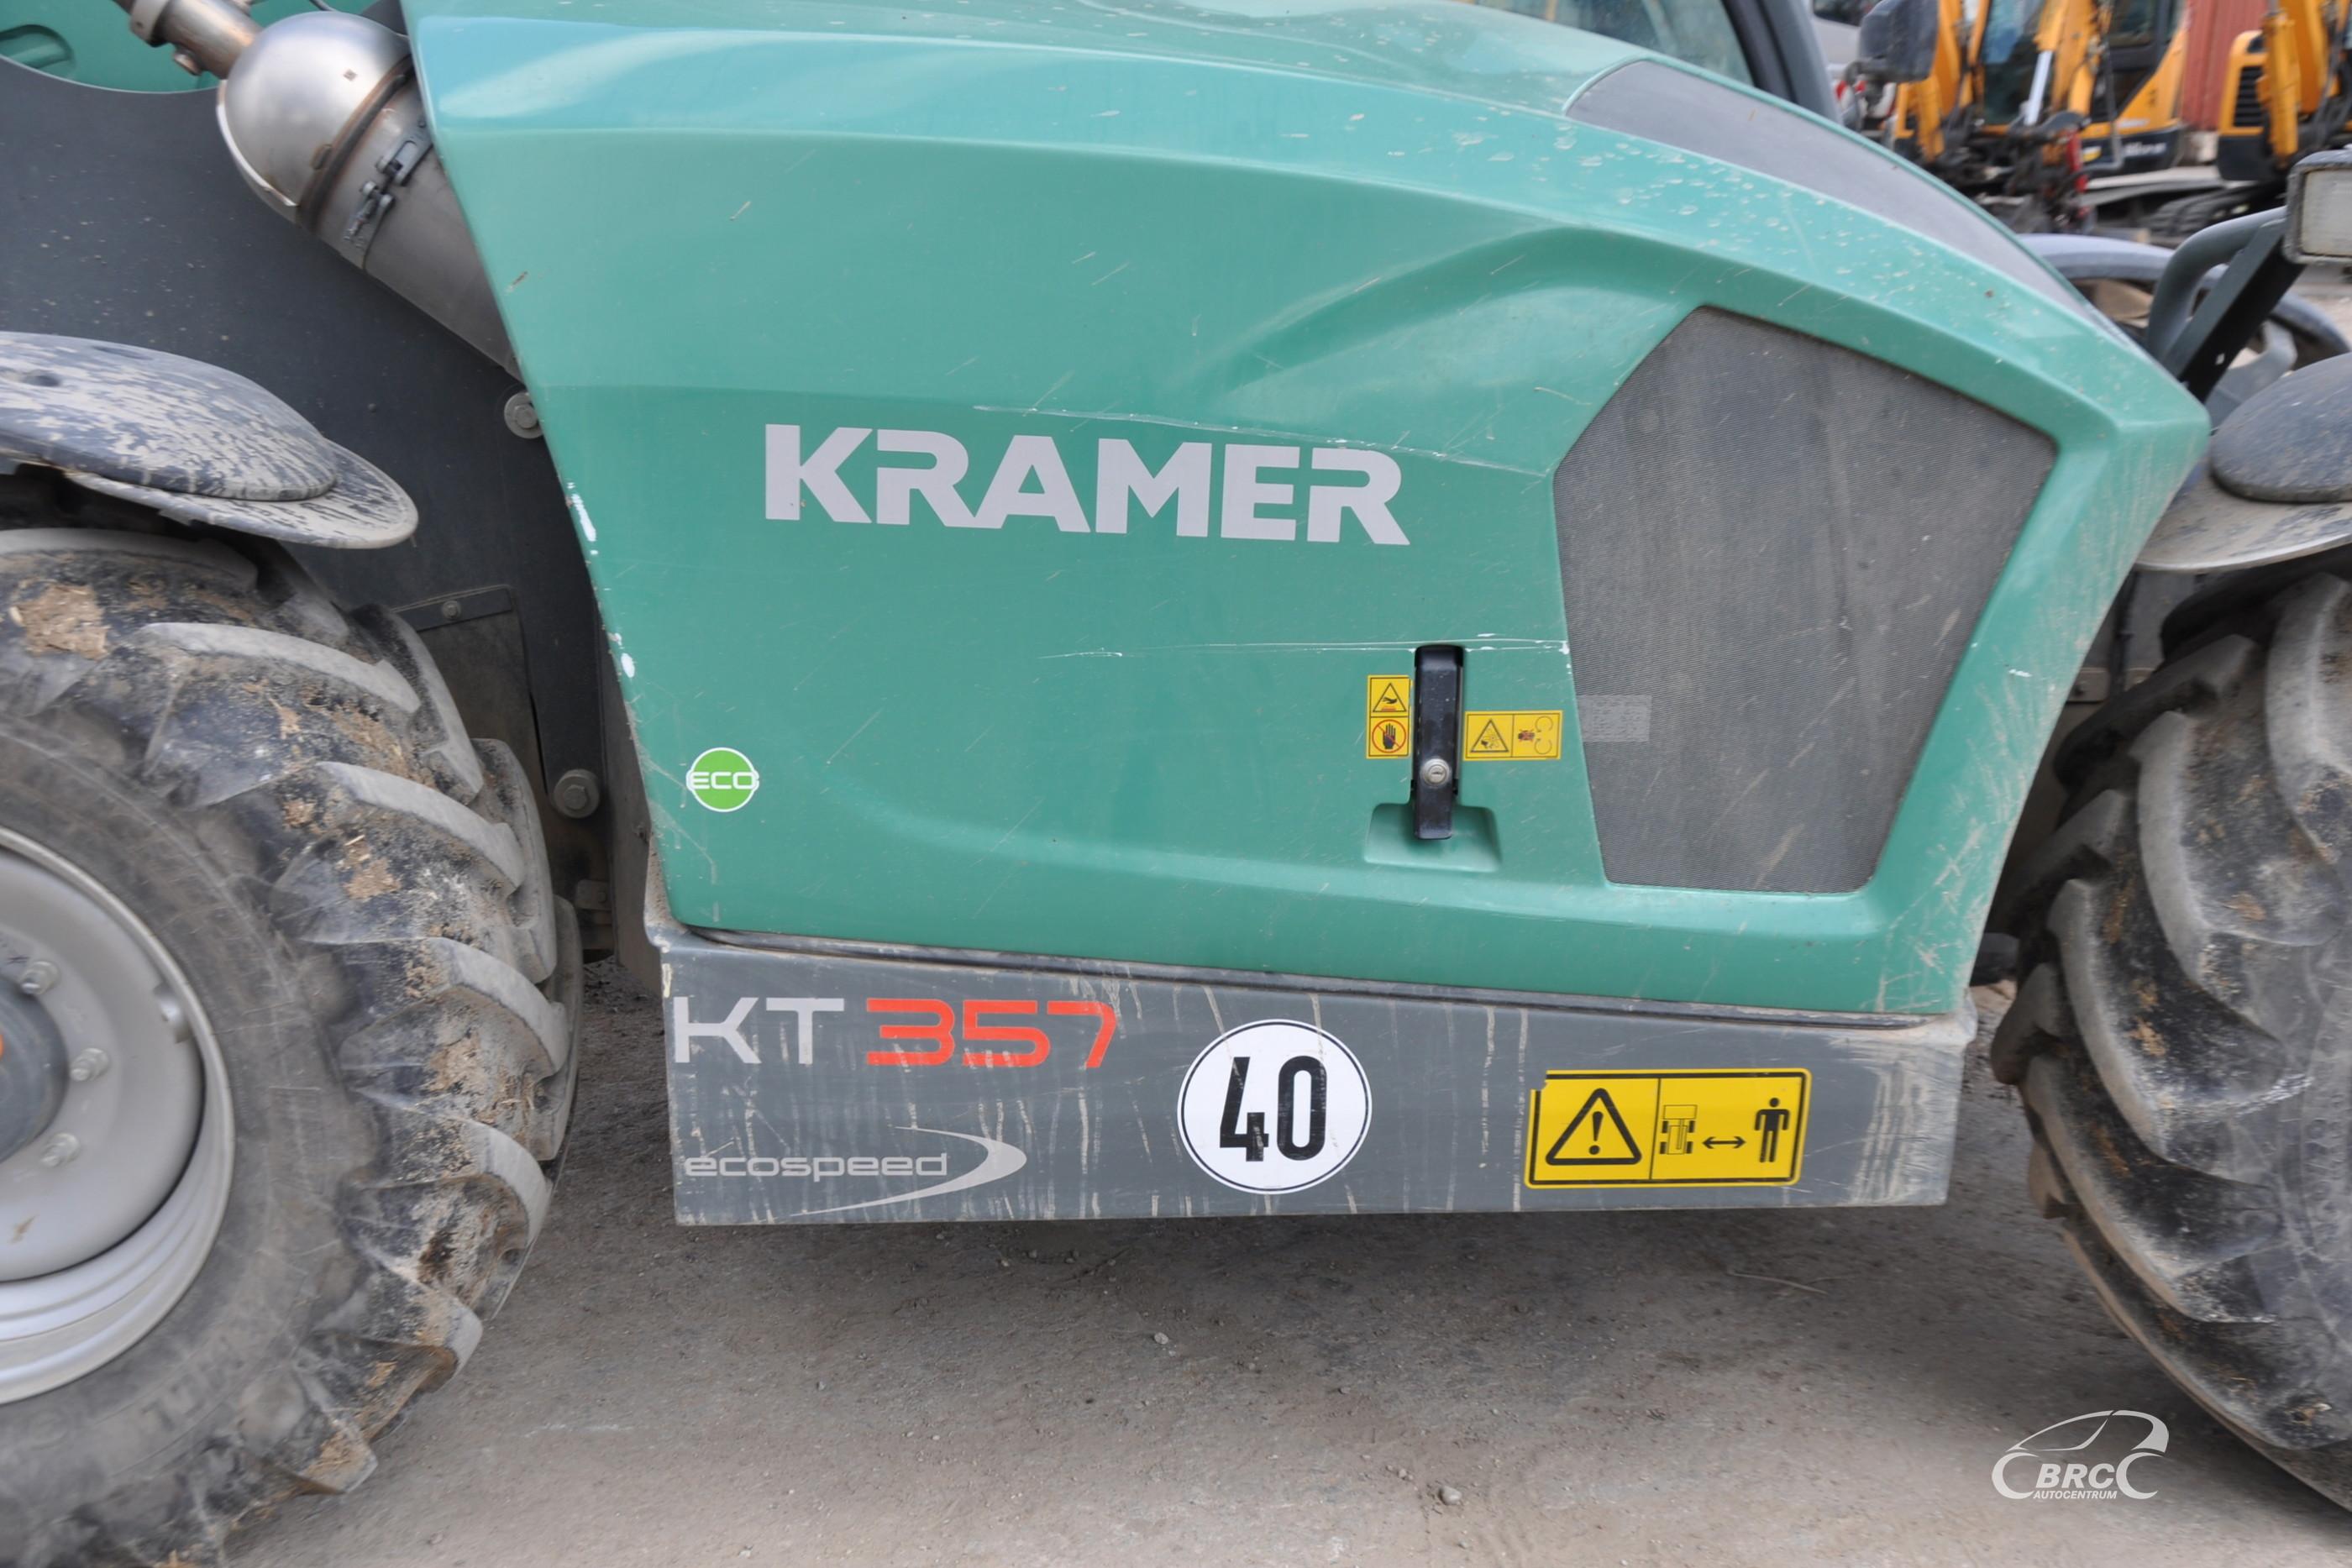 Kramer KT357